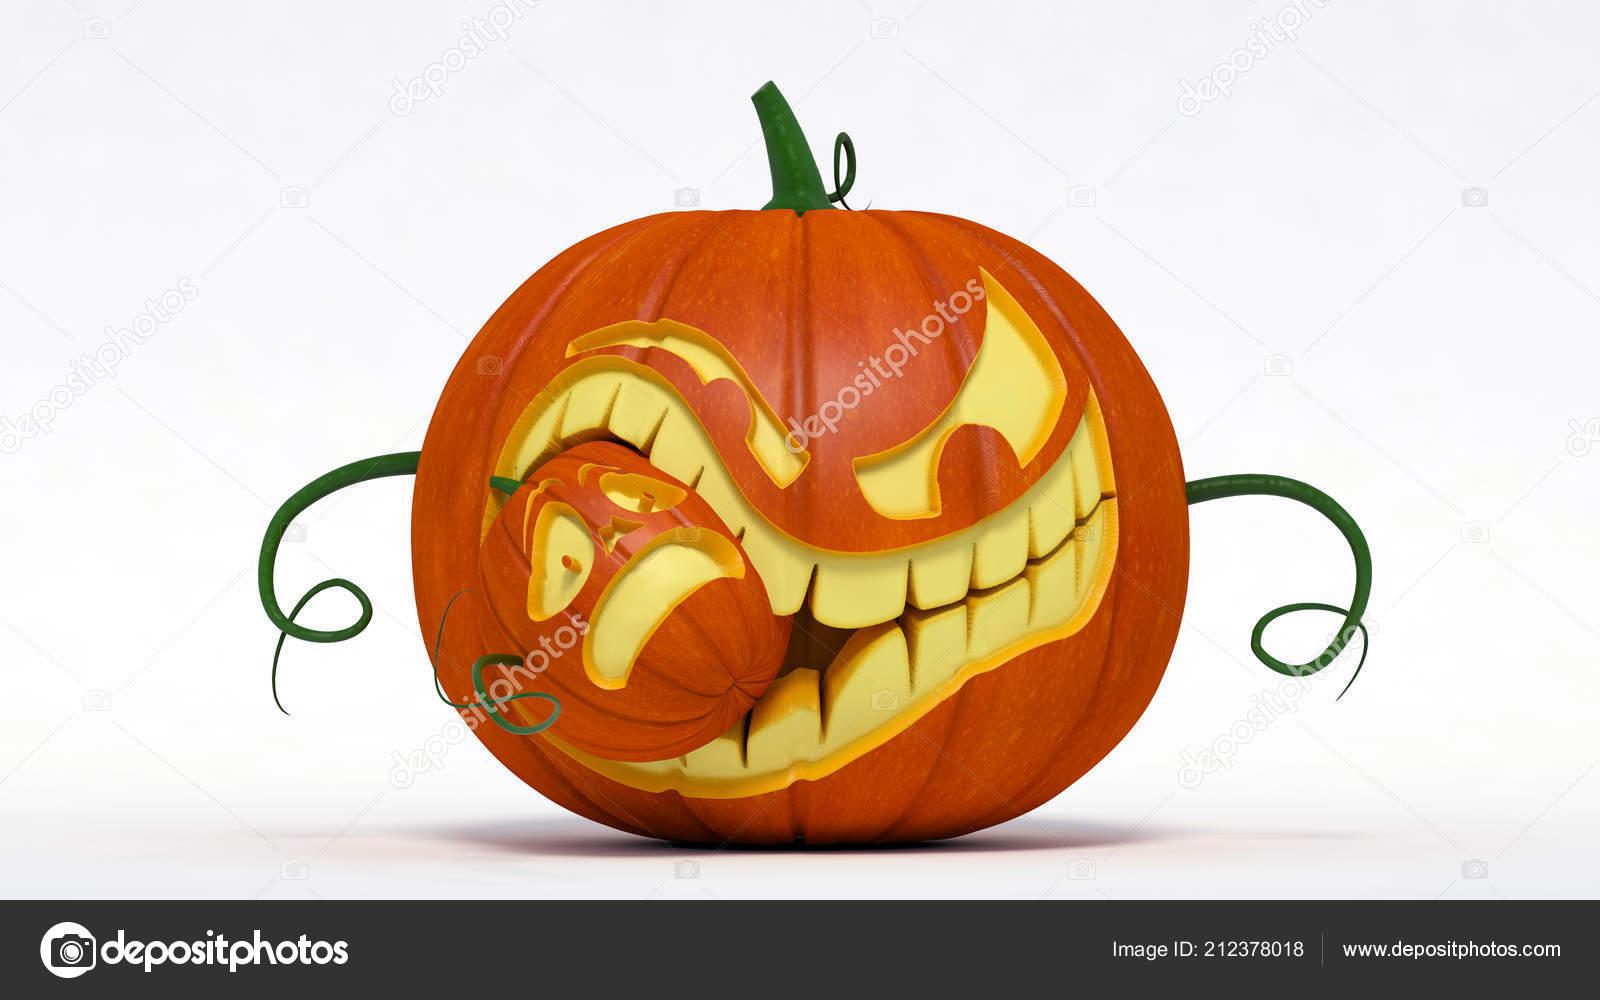 Halloween Evil Jack Lantern Pumpkin Eating Small Pumpkin Illustration Stock Photo C Thiagommelo Gmail Com 212378018